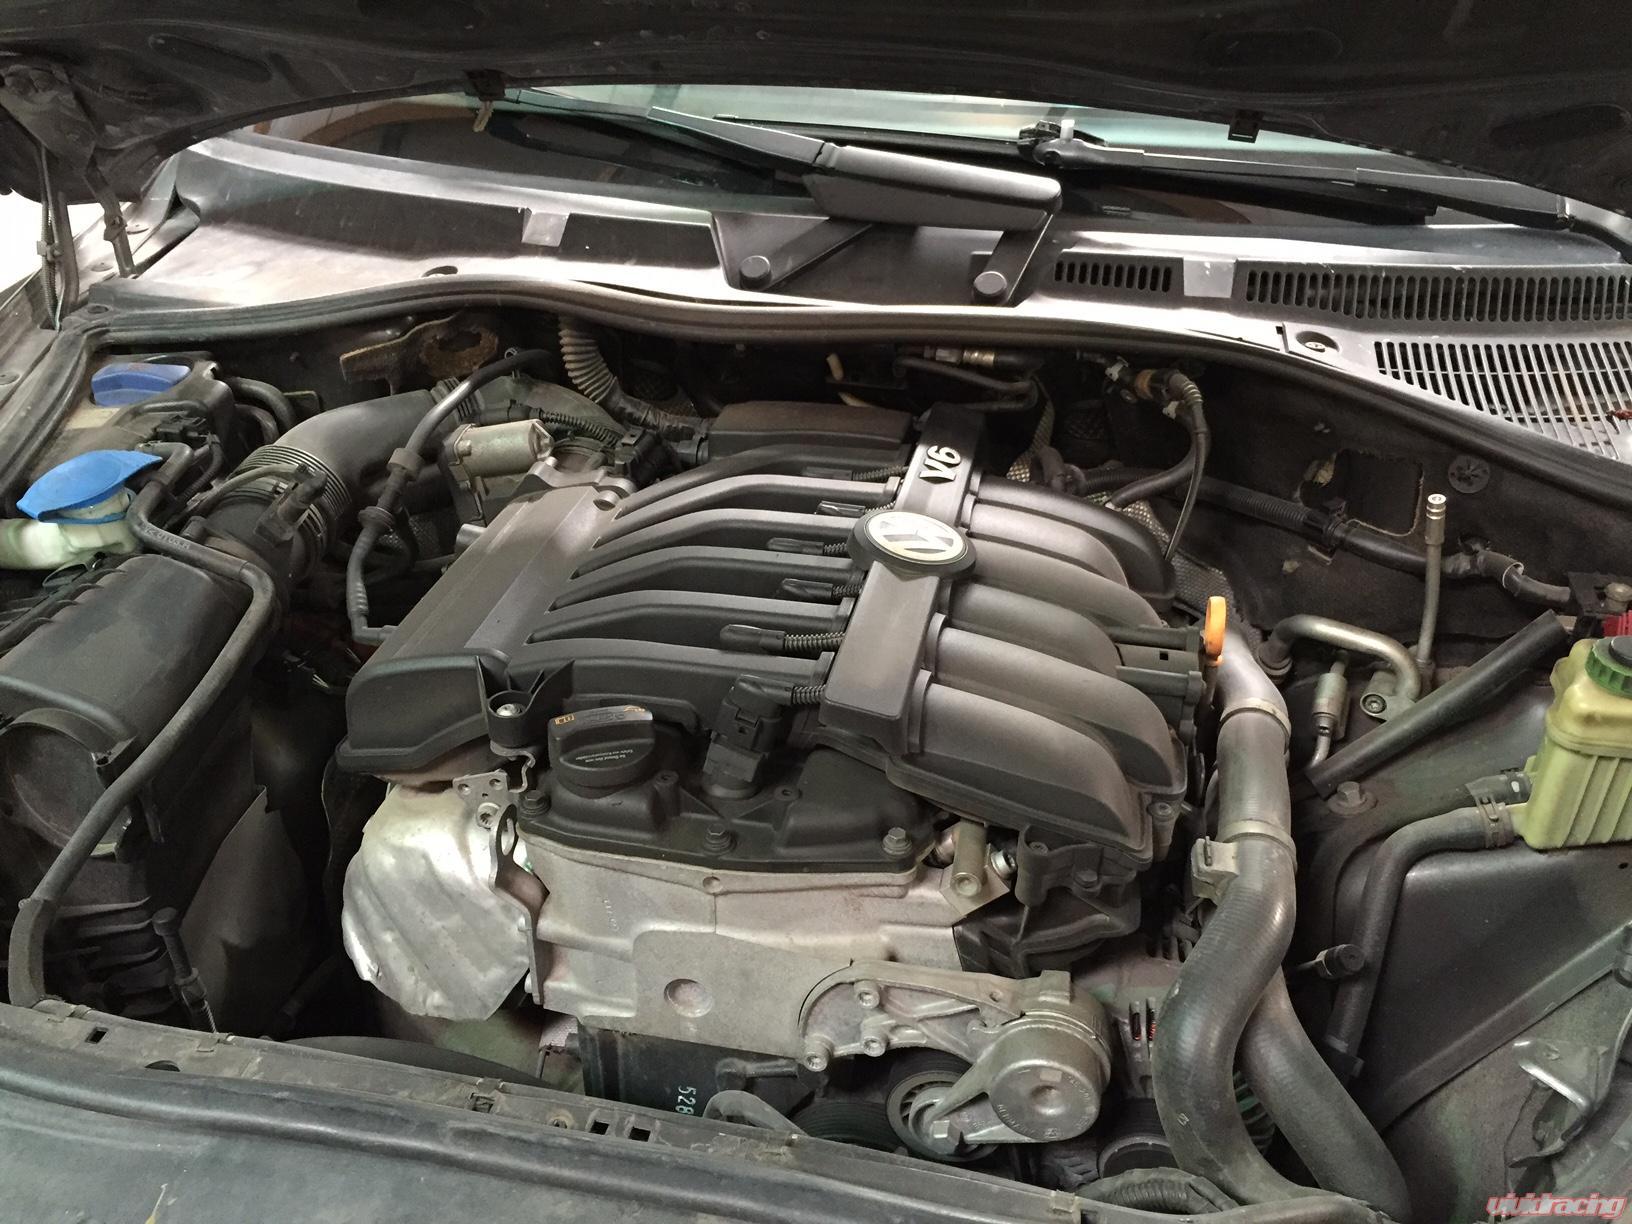 Vr Tuned Ecu Flash Tune Volkswagen Touareg 36l Vr6 Type 7p 250hp Ecm Wiring Diagram 2006 Vrt